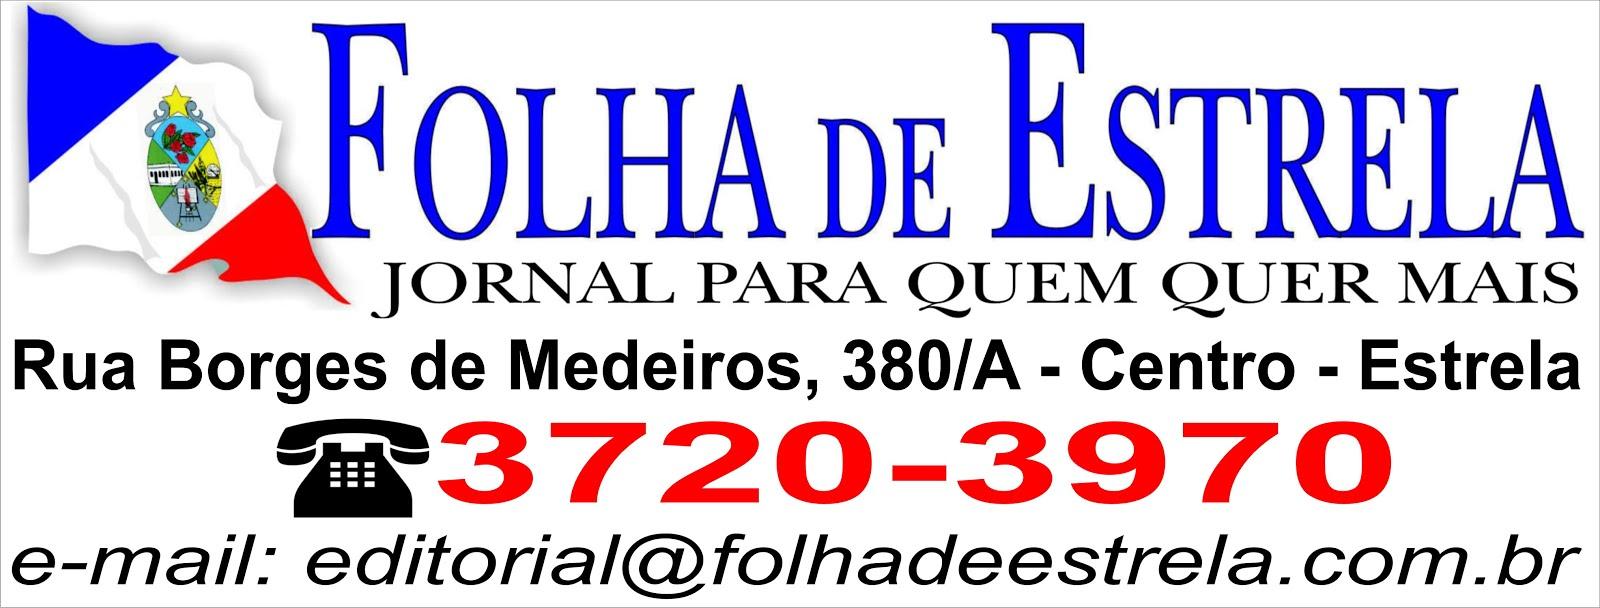 Folha de Estrela - 3720-3970